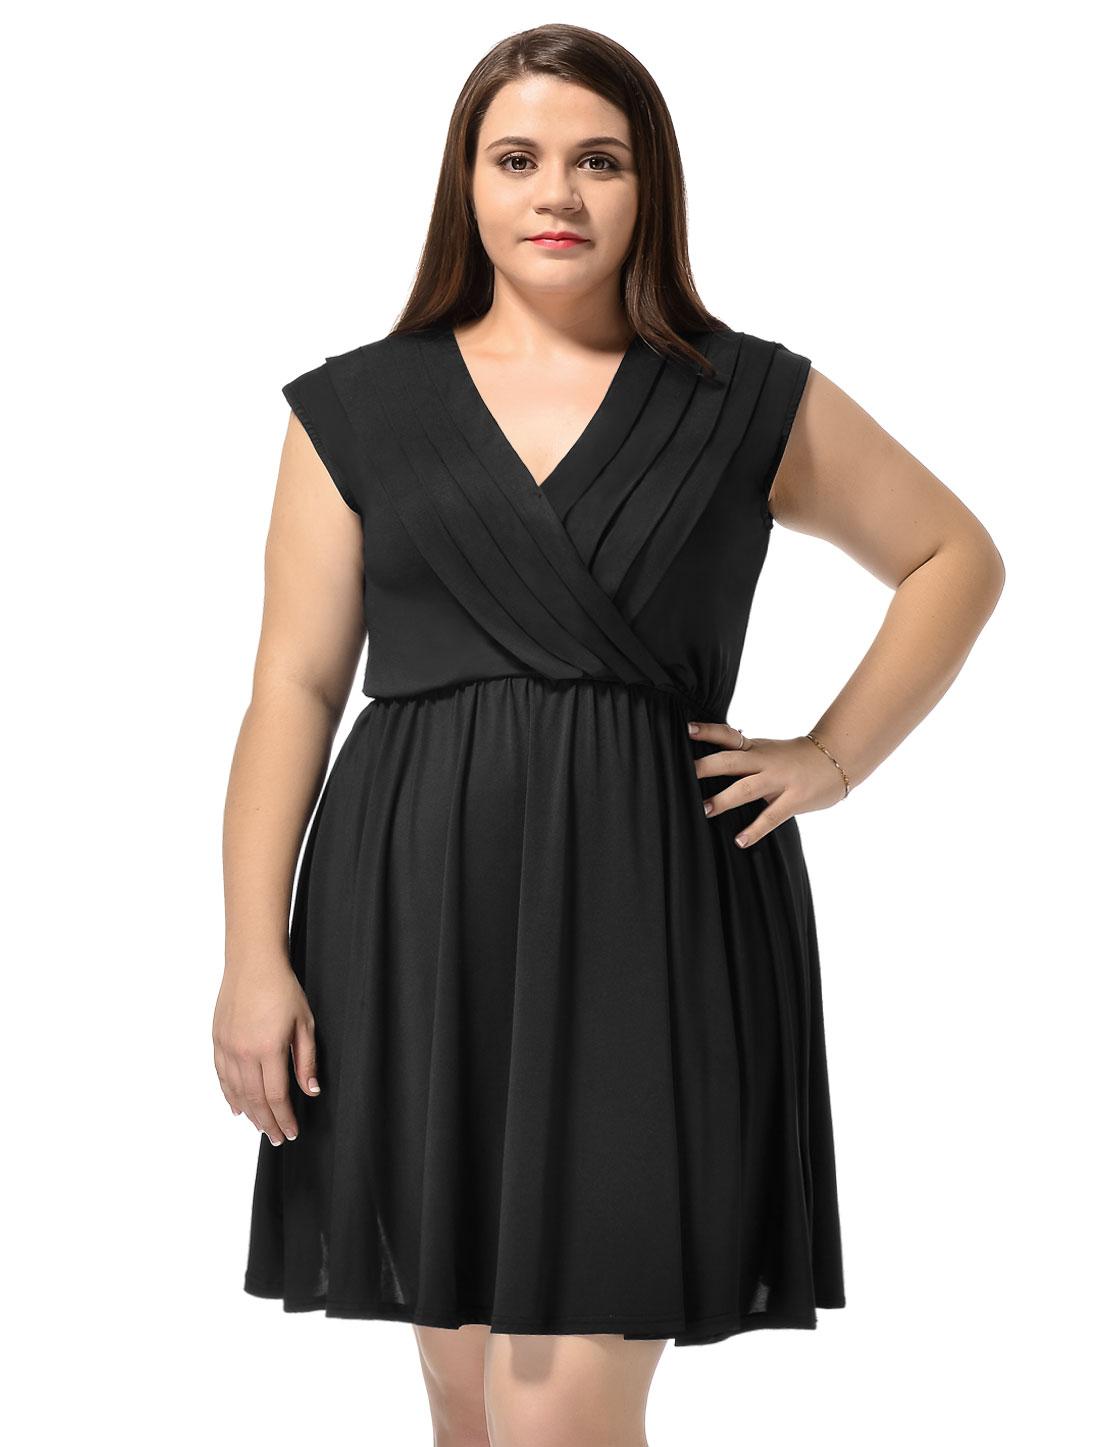 Ladies Cap Sleeves Pleated Crossover V Neck Plus Size Wrap Dress Black 3X